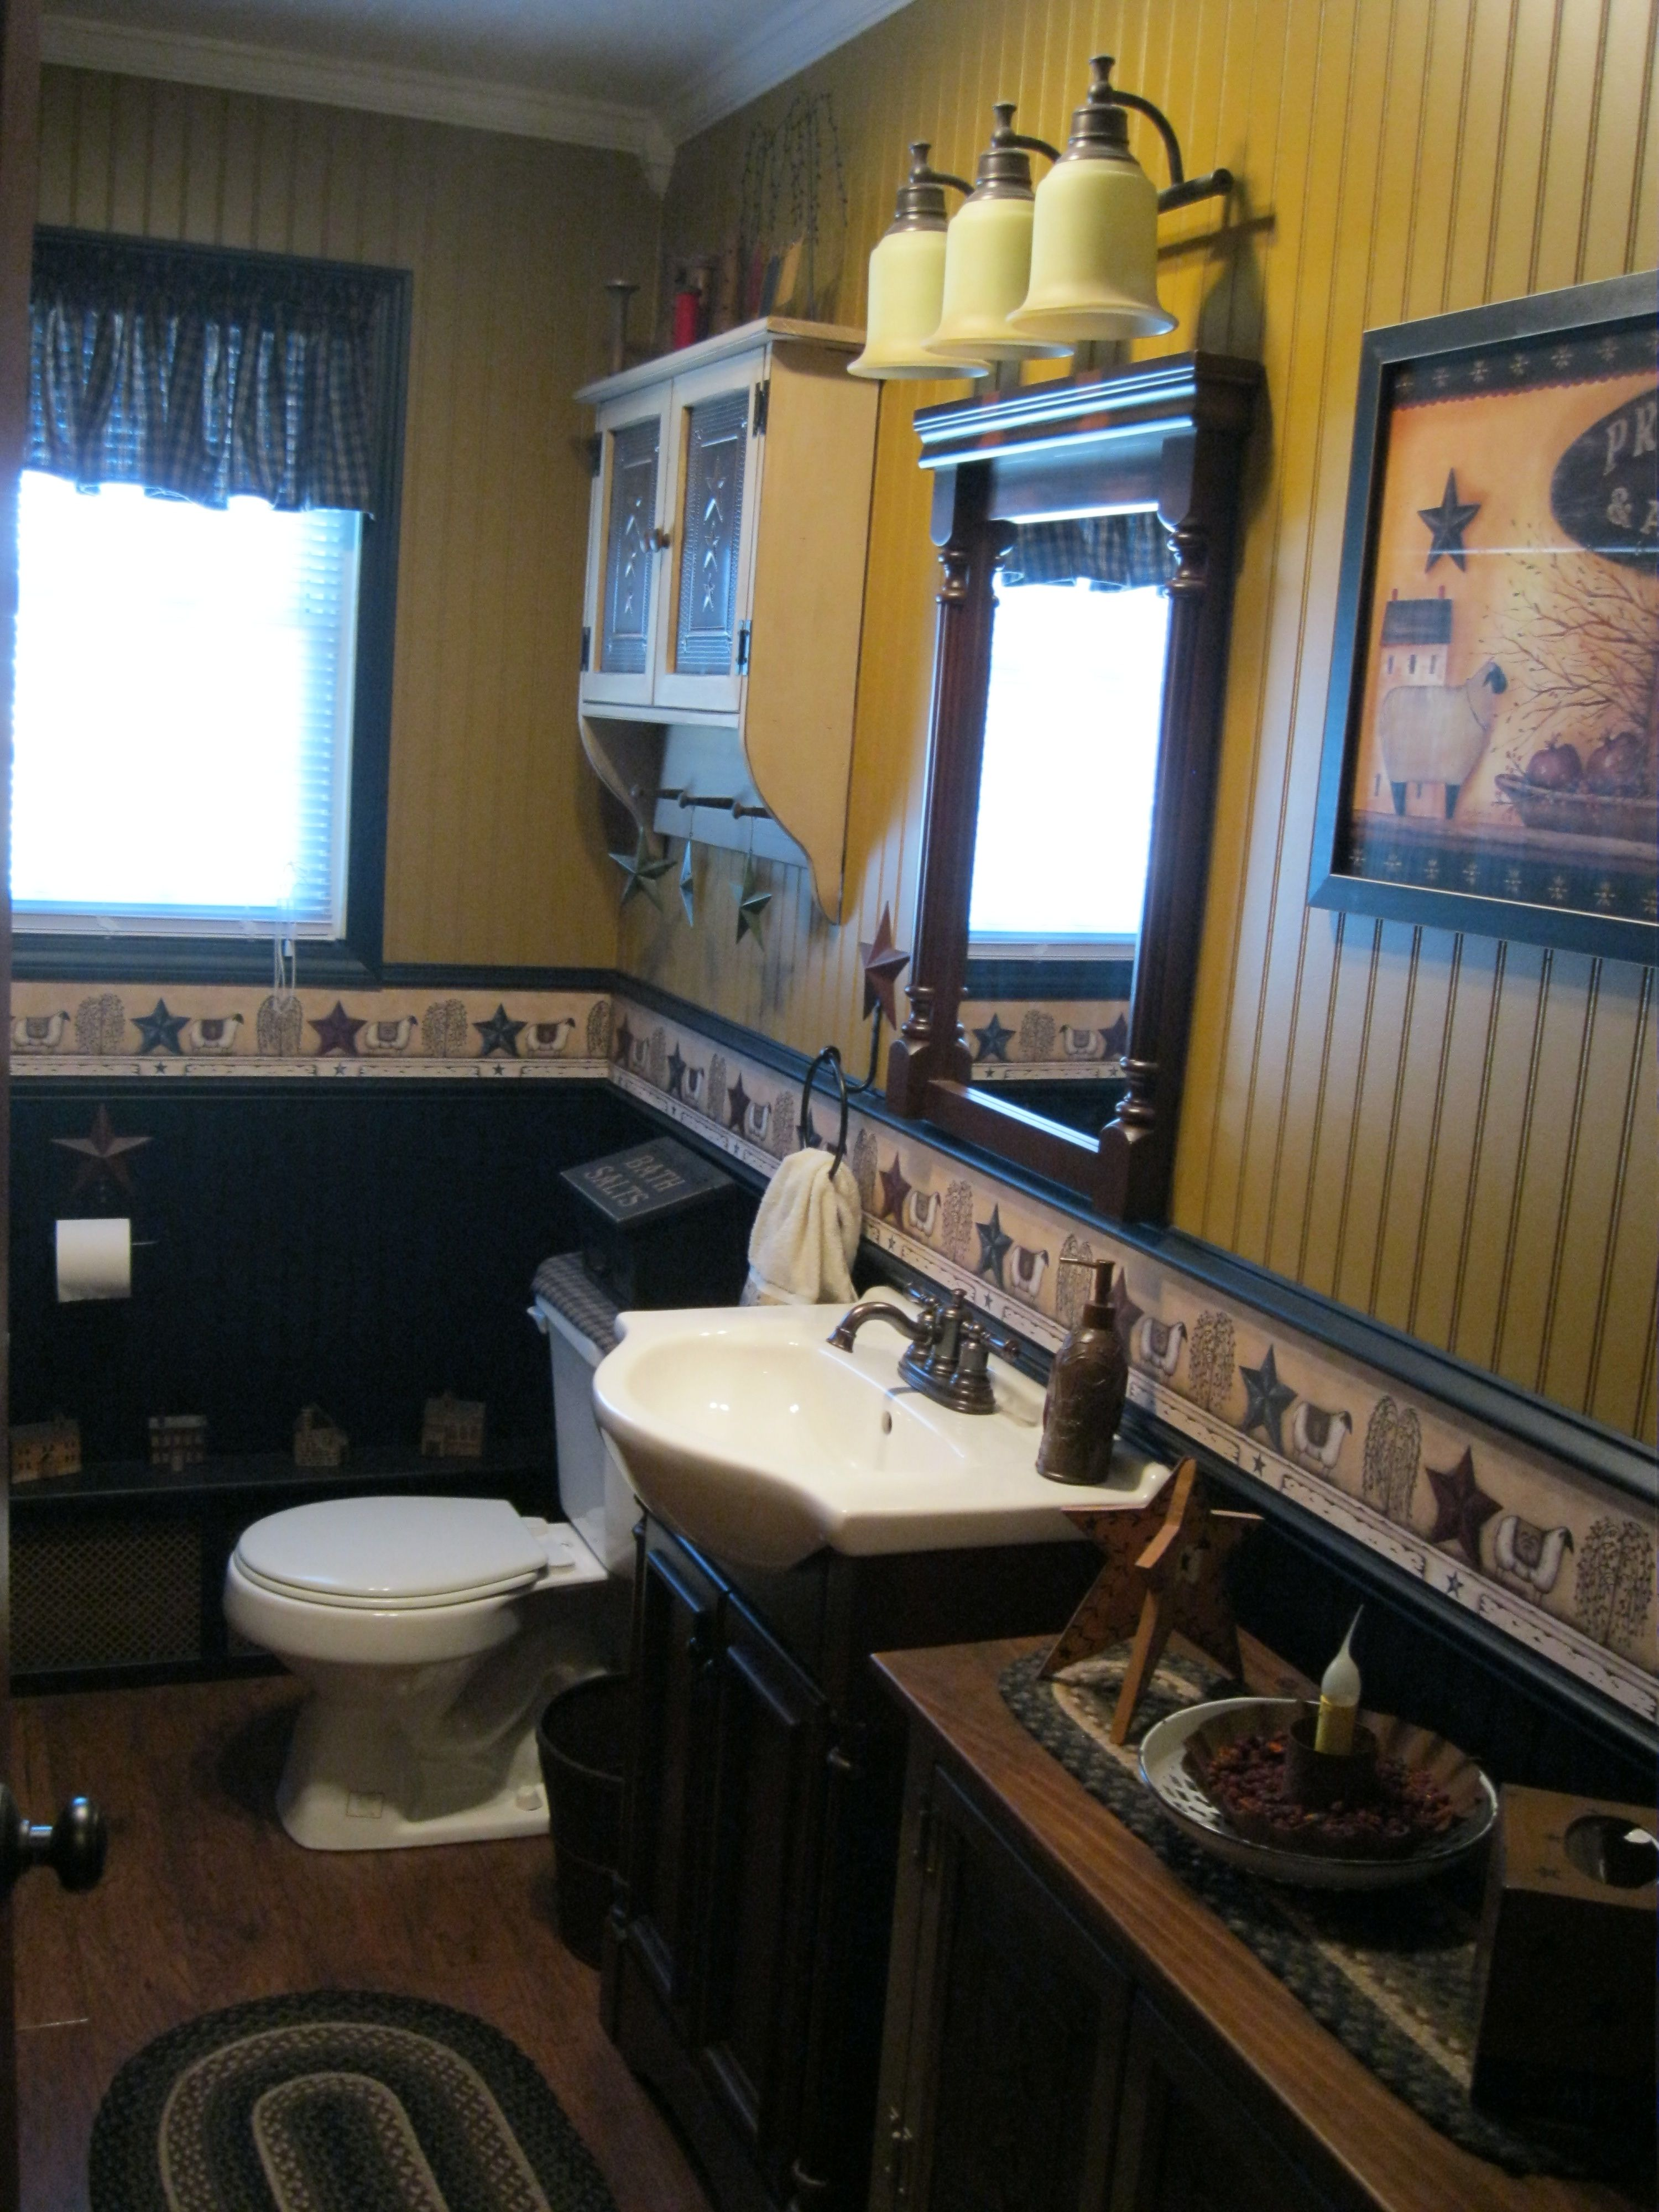 Pin by Smithfield Home Decor on Home | Primitive bathroom decor, Primitive country bathrooms ...